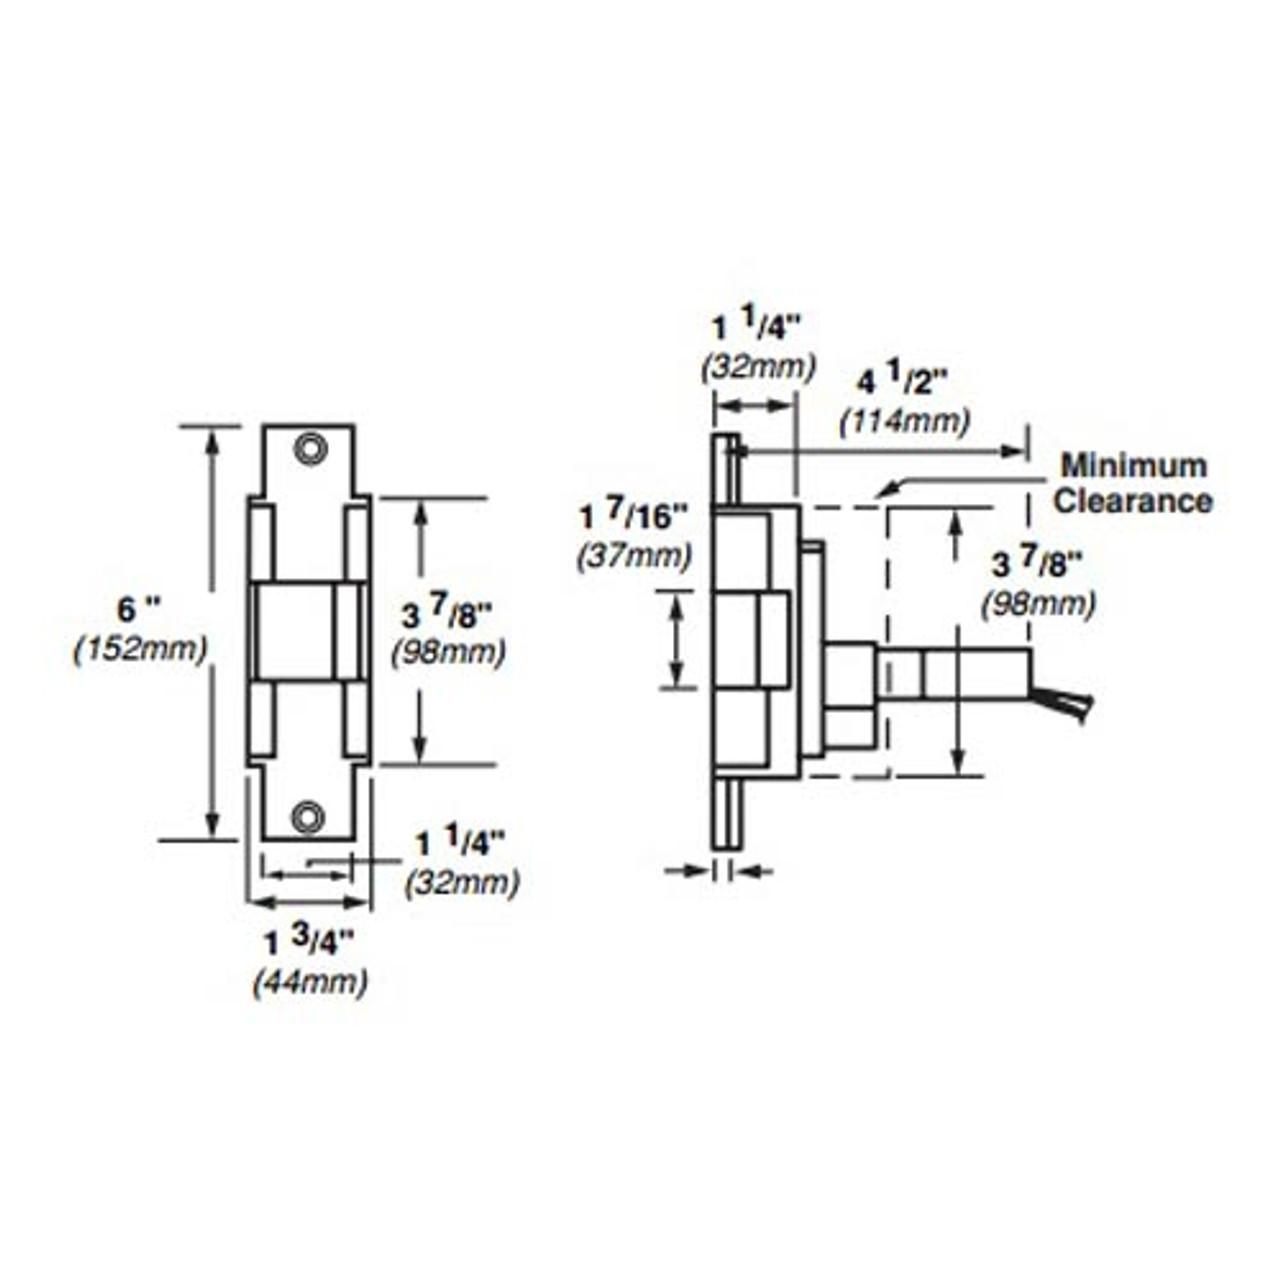 6221-24VDC-US10B Von Duprin Electric Strike for Mortise or Cylindrical Locksets in Dark Bronze Finish